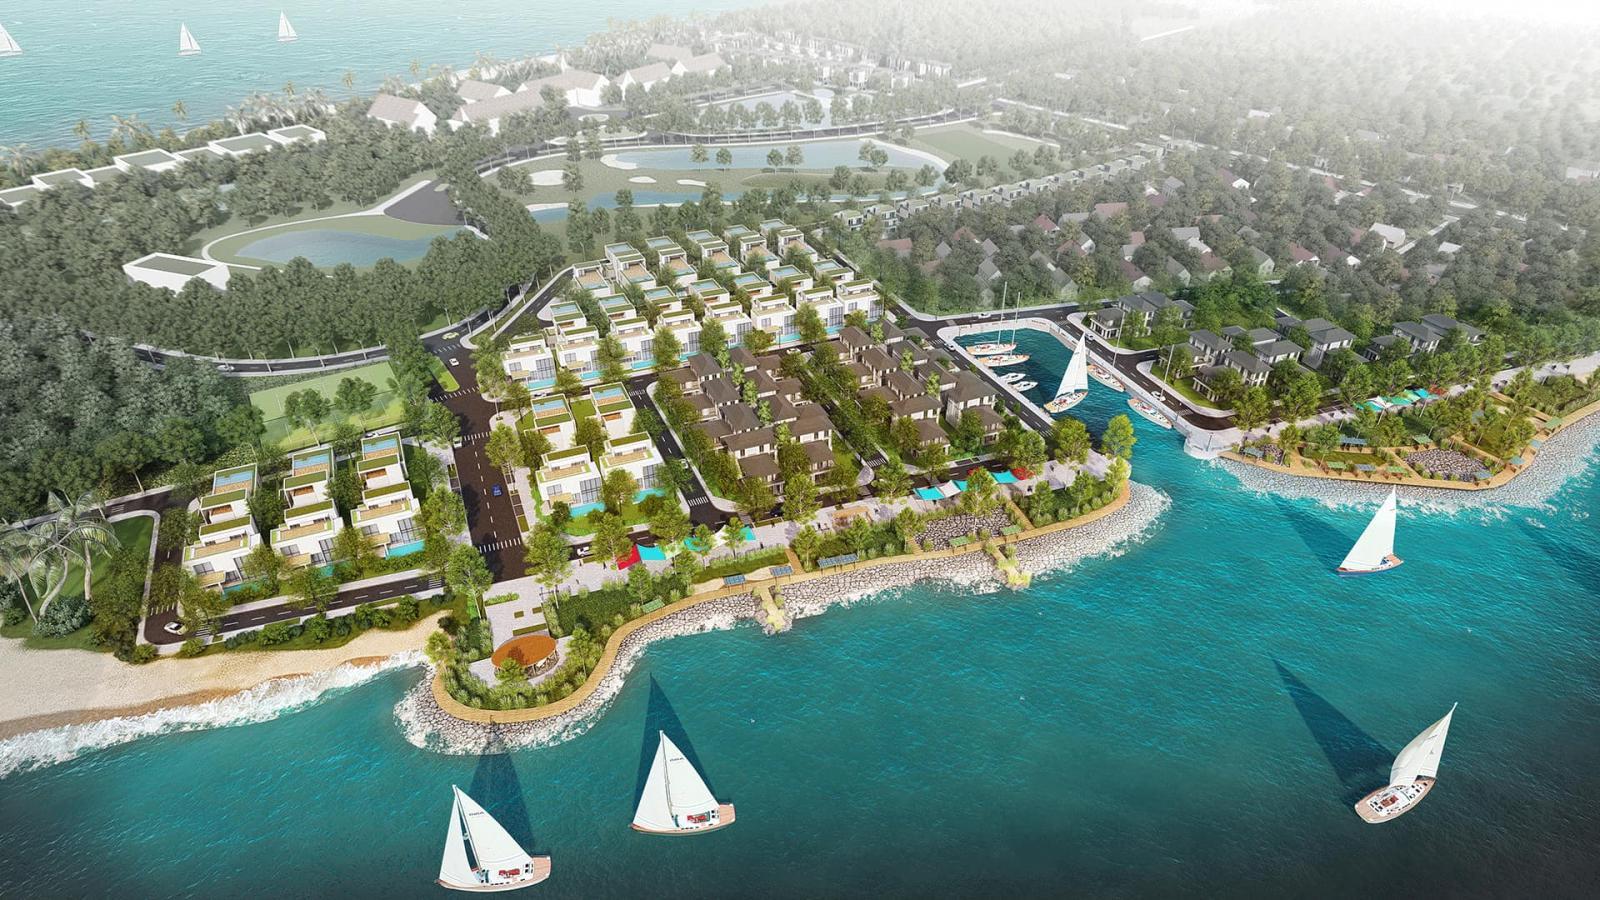 Phối cảnh dự án La Rivière Quảng Bình